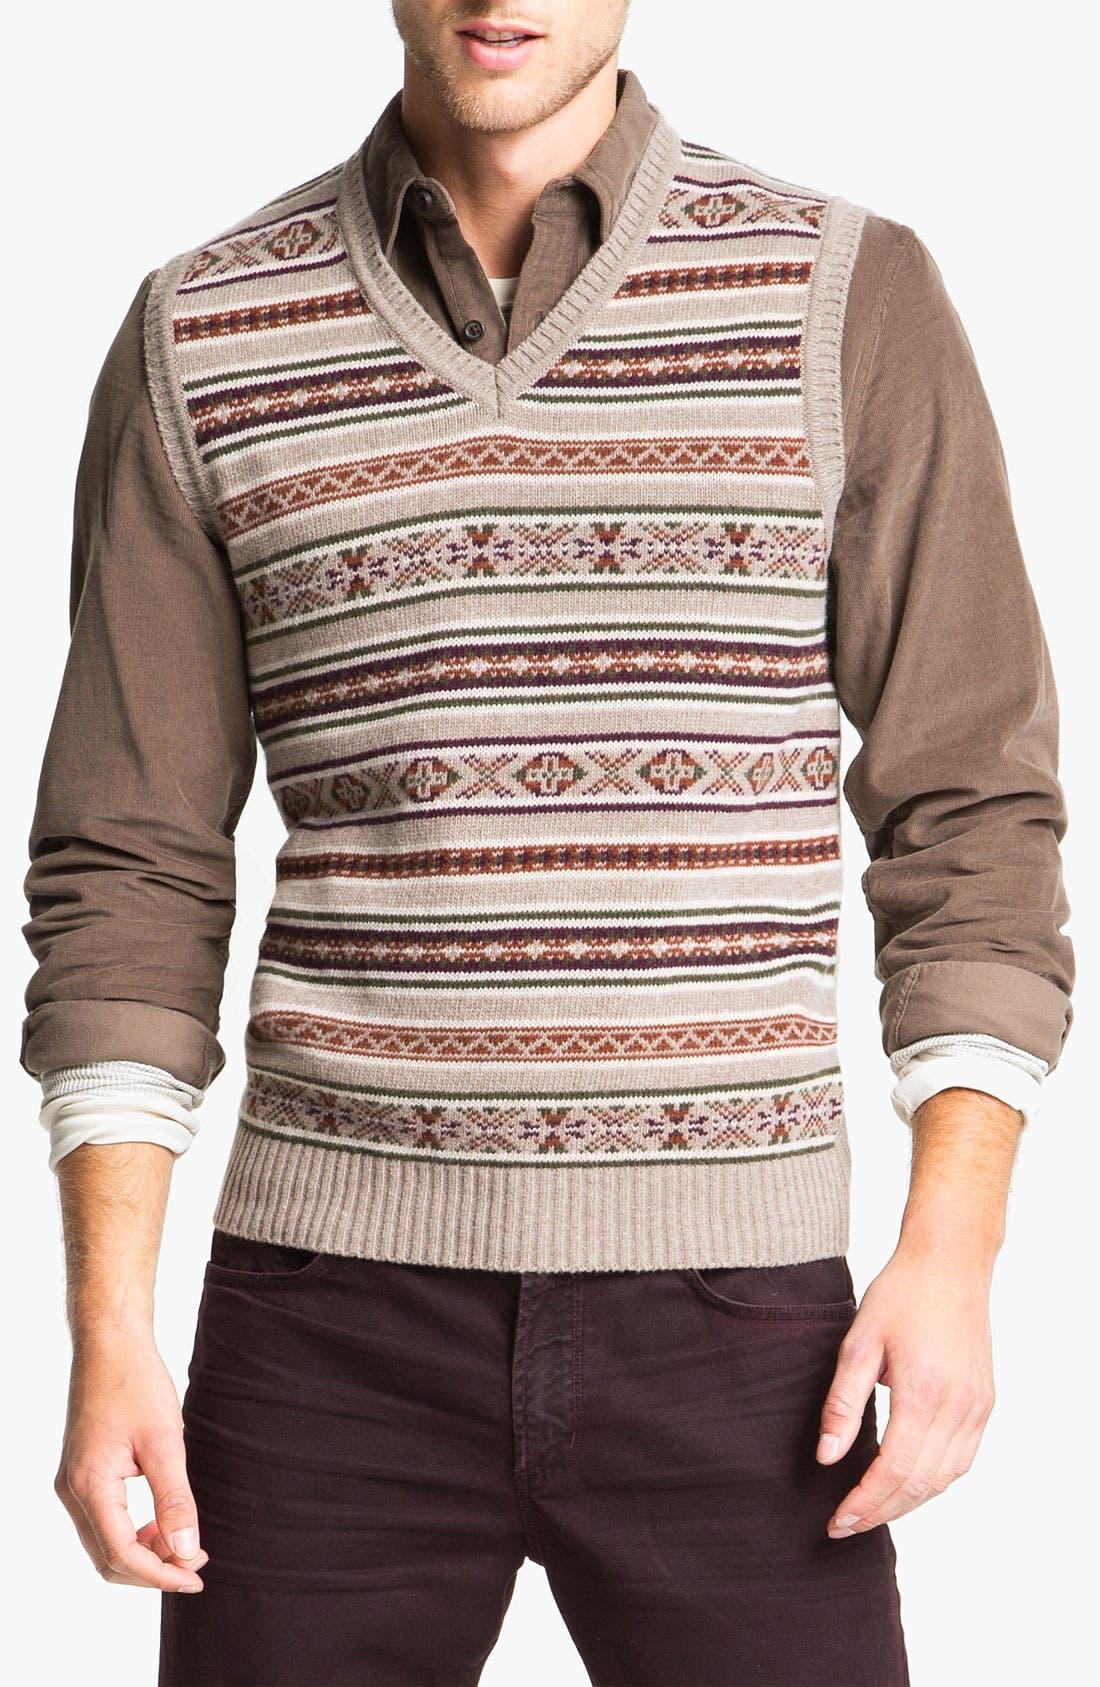 Alternate Image 1 Selected - Fiesole V-Neck Wool Blend Sweater Vest